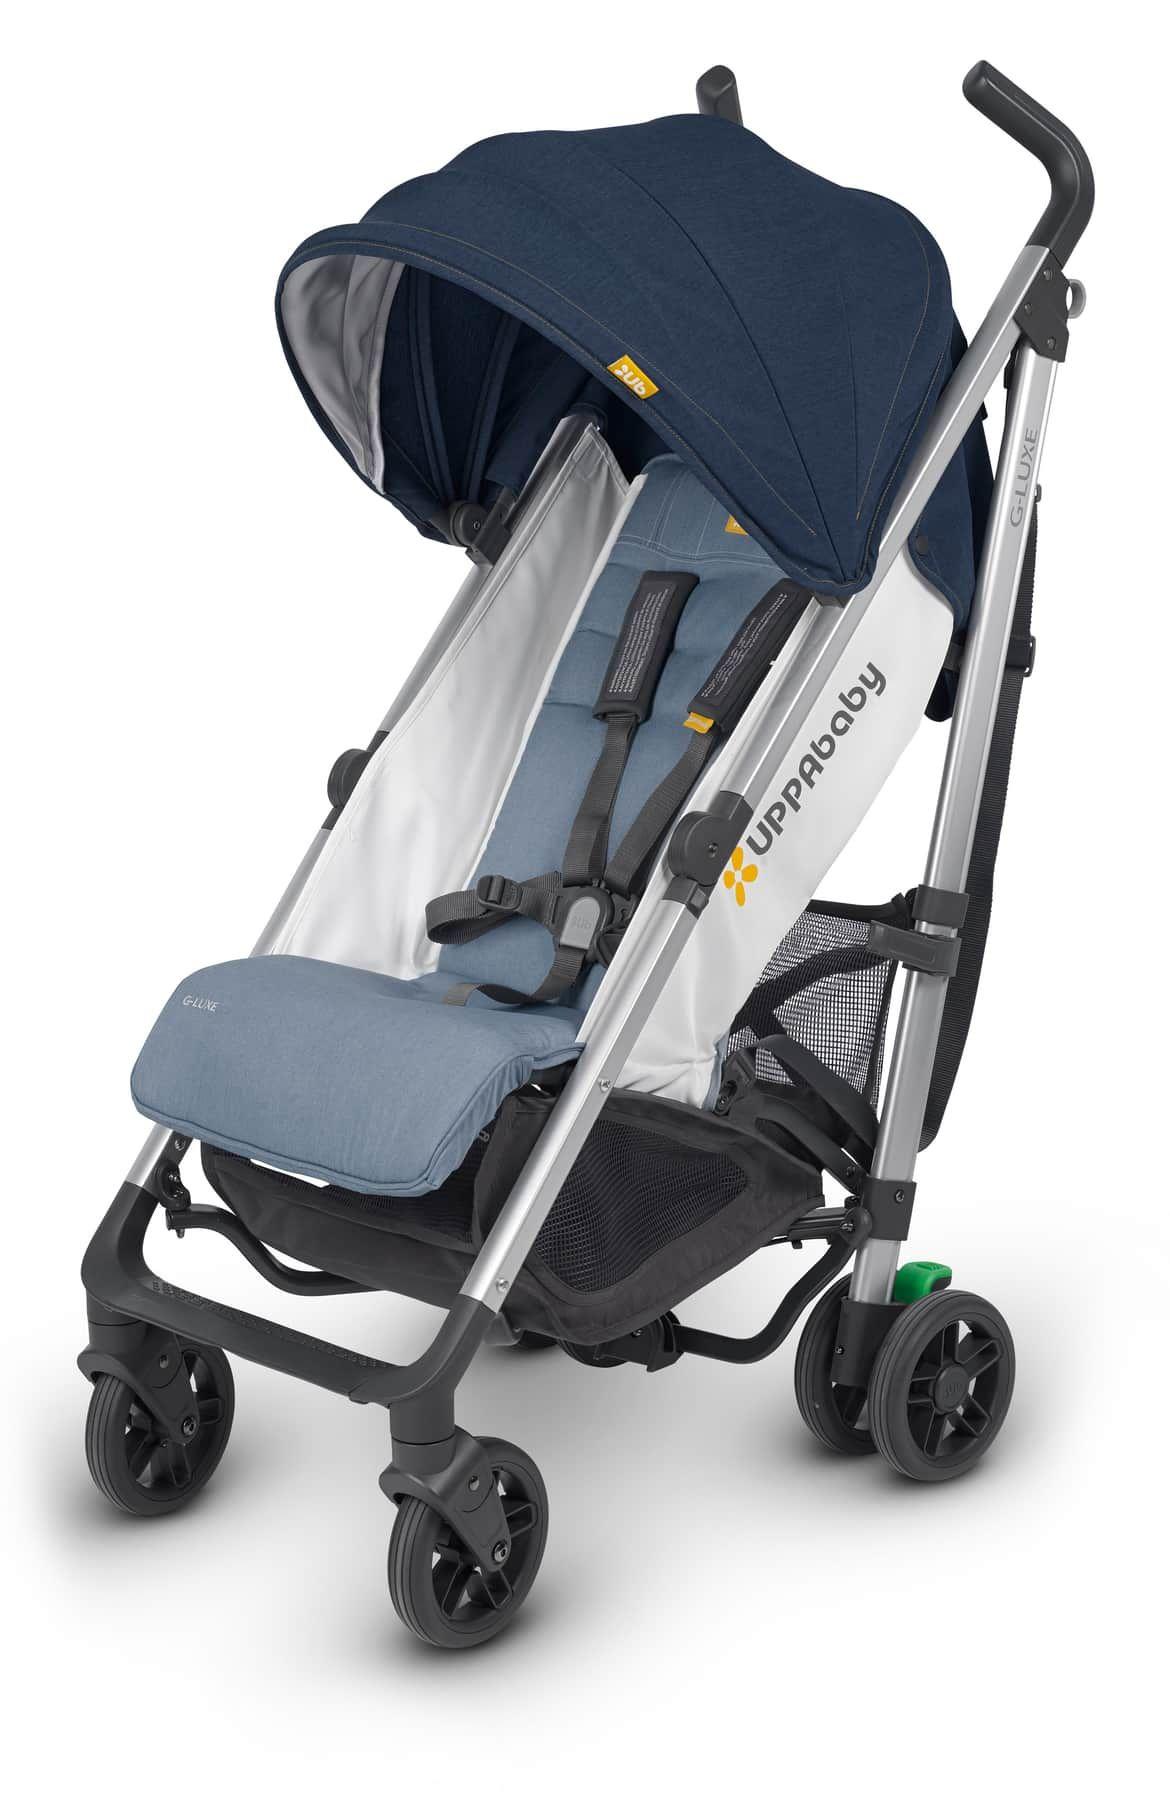 UPPAbaby GLUXE 2018 Reclining Umbrella Stroller